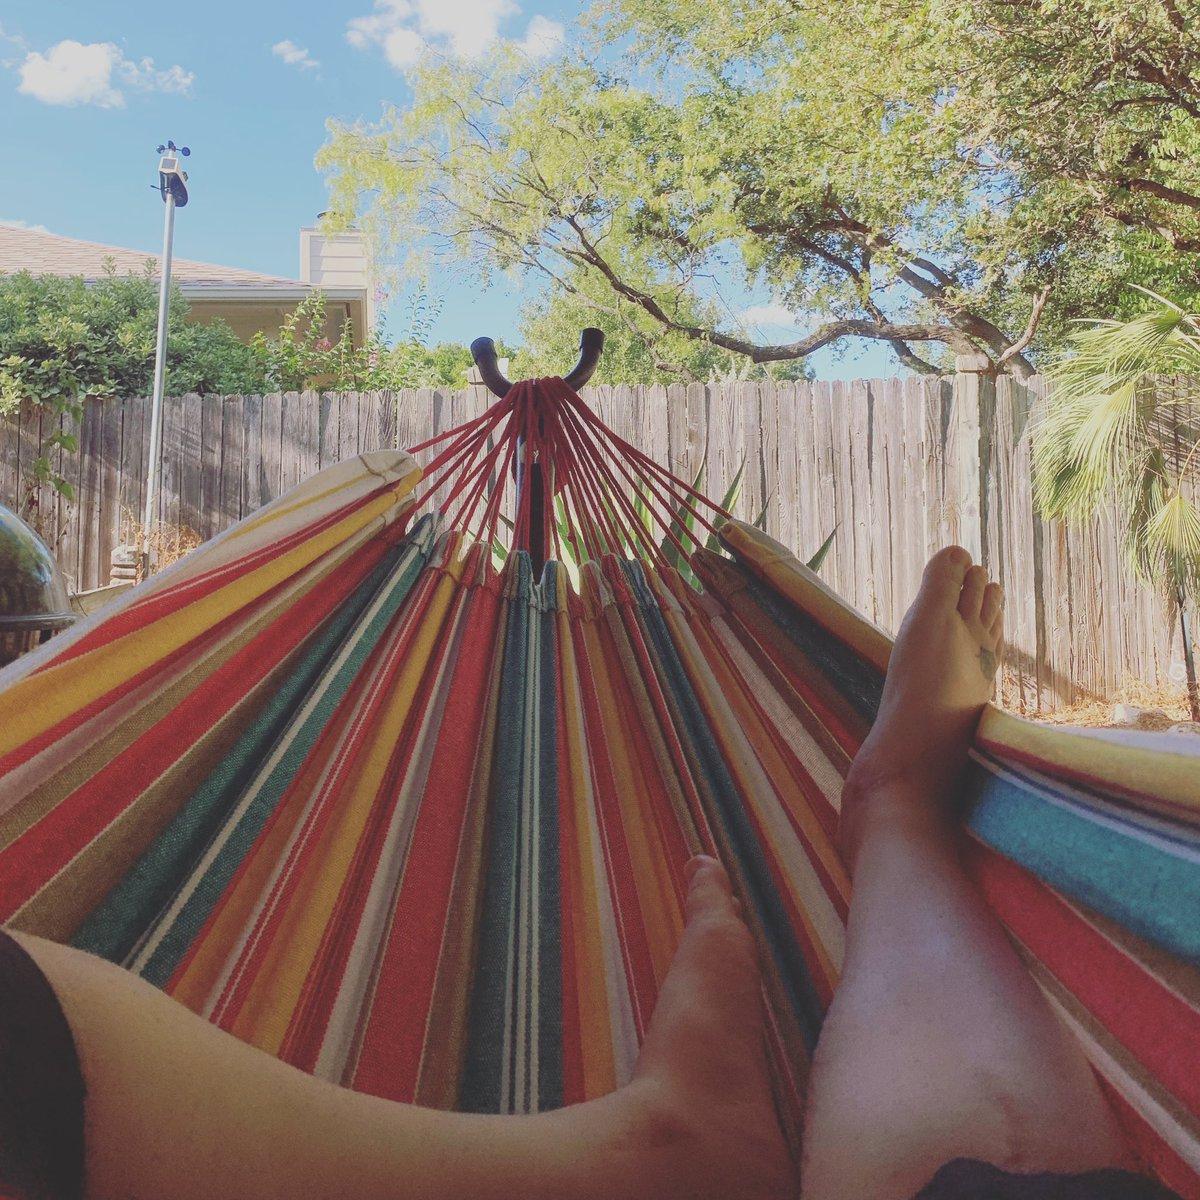 Me: outside,enjoying some time in my hammock Kitten: WTFFFFFFFFFFFF *screams in horror*